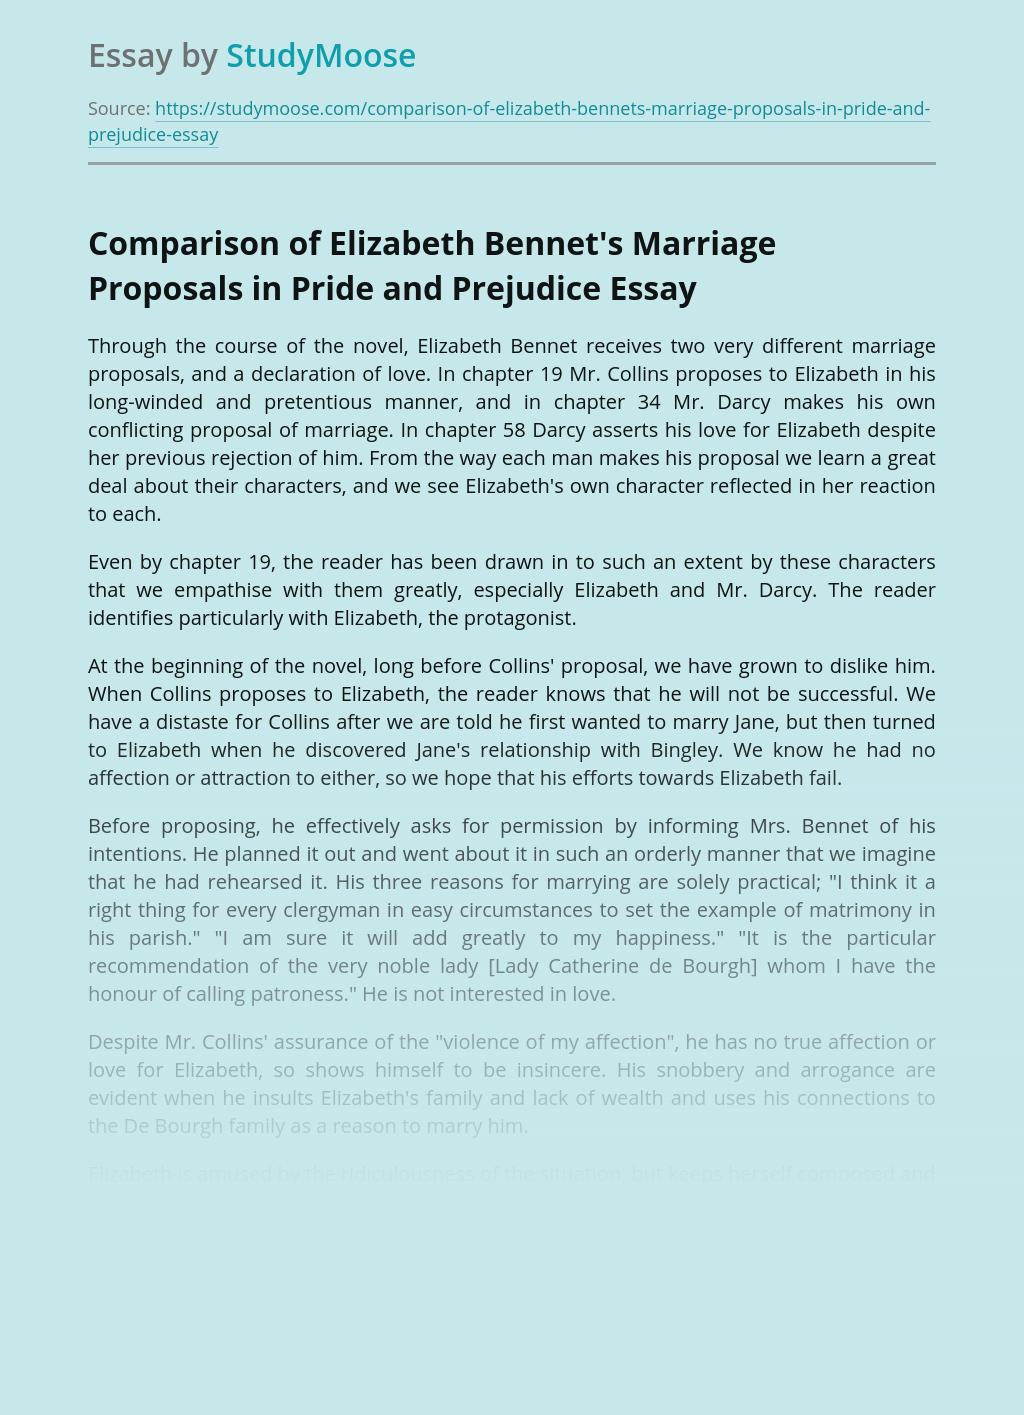 Comparison of Elizabeth Bennet's Marriage Proposals in Pride and Prejudice